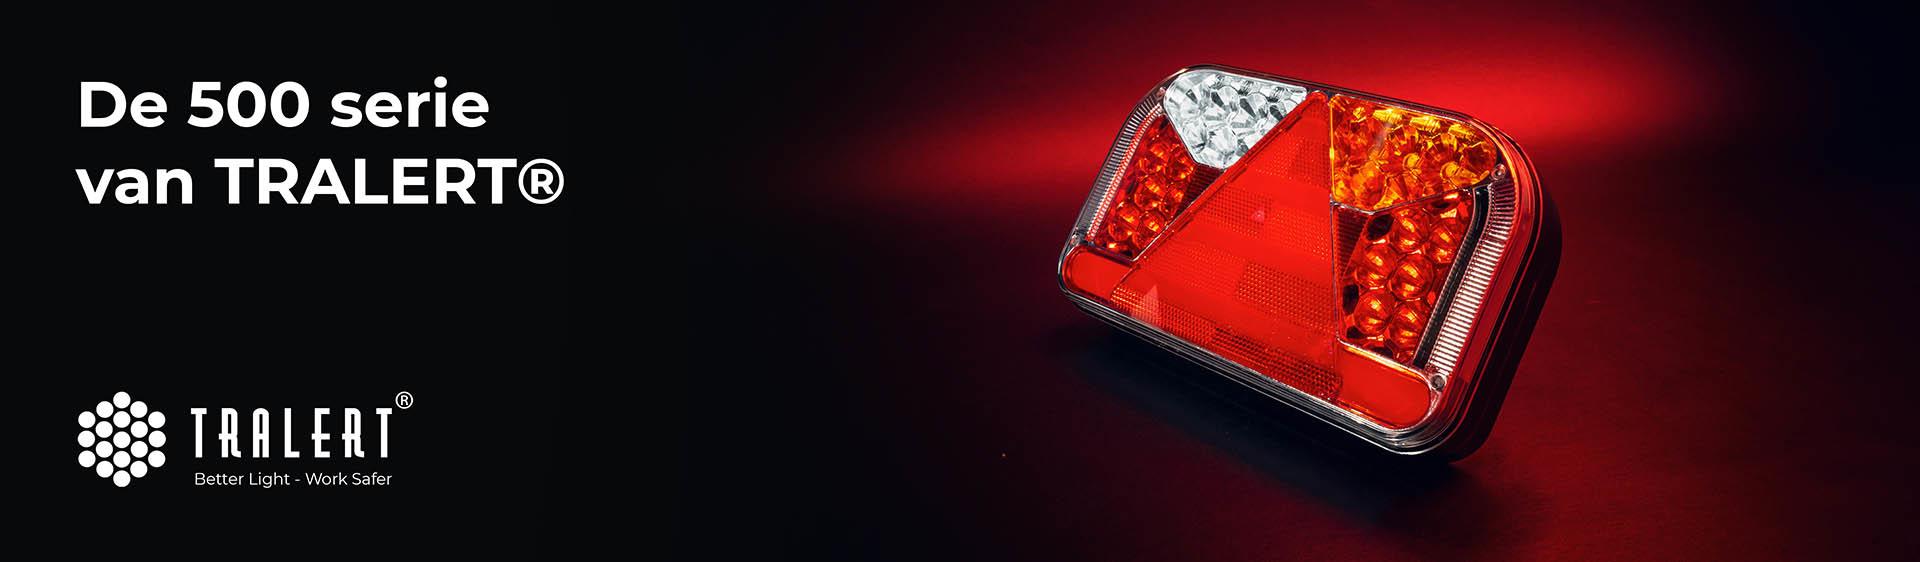 Tralert 500 serie LED achterlicht